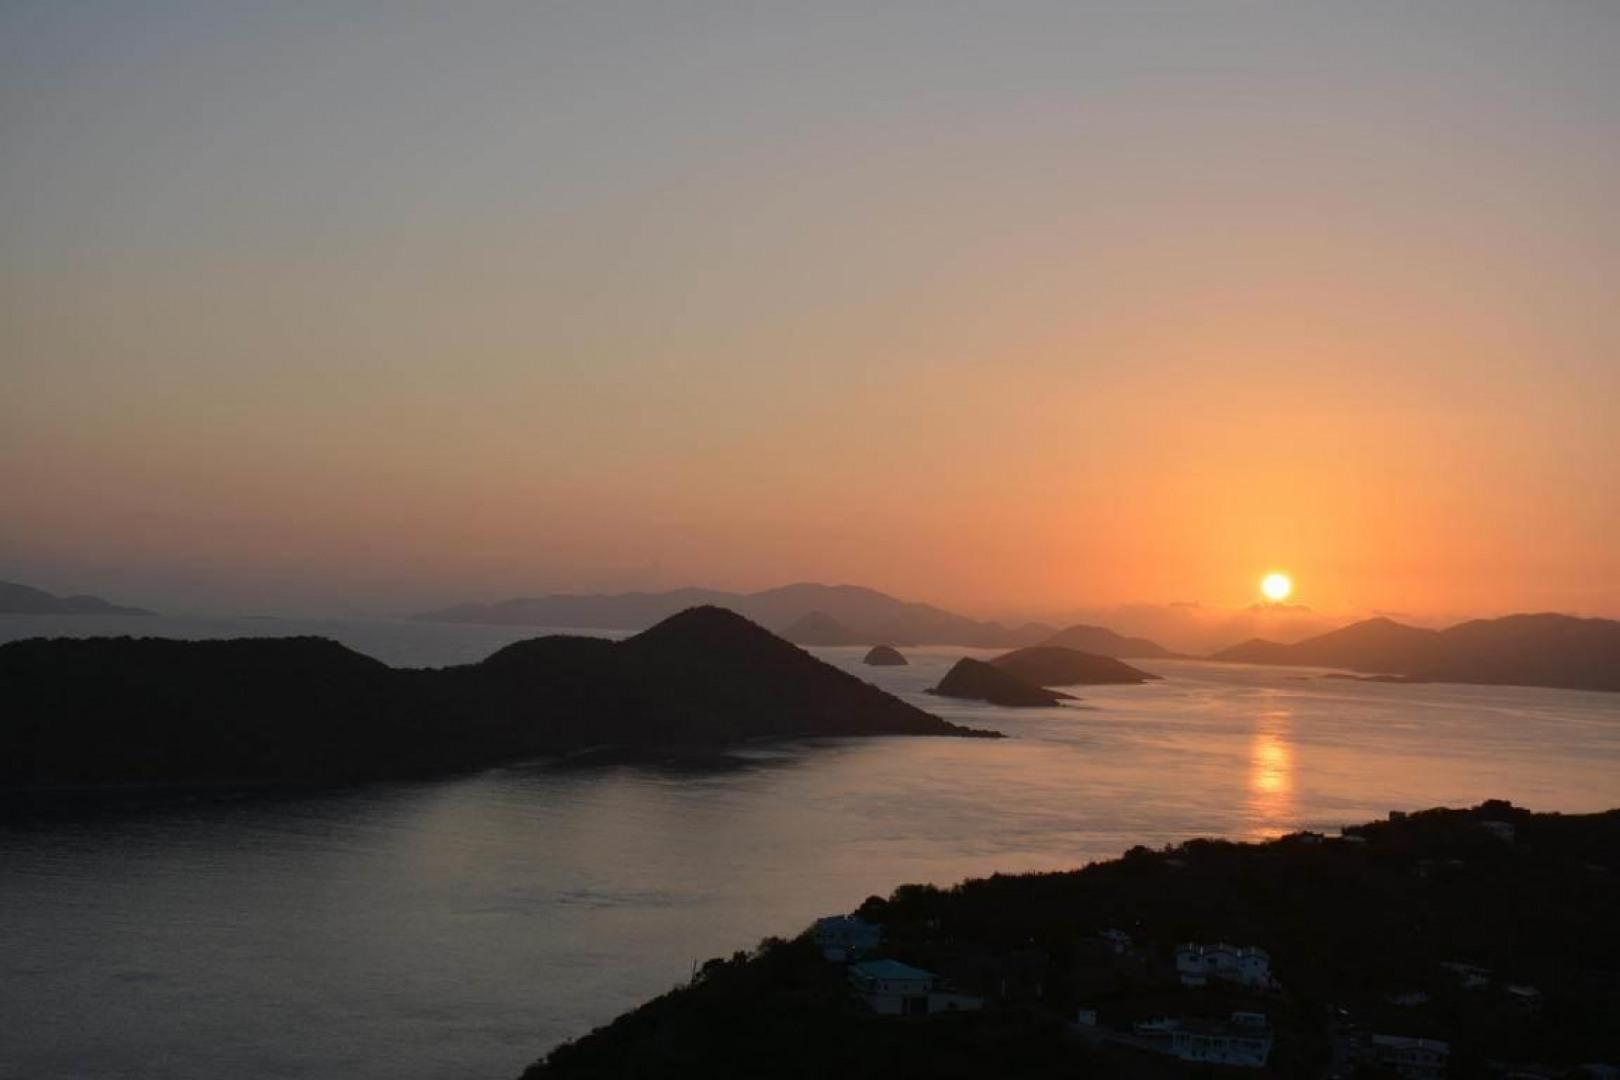 Sunset over US Virgin Islands